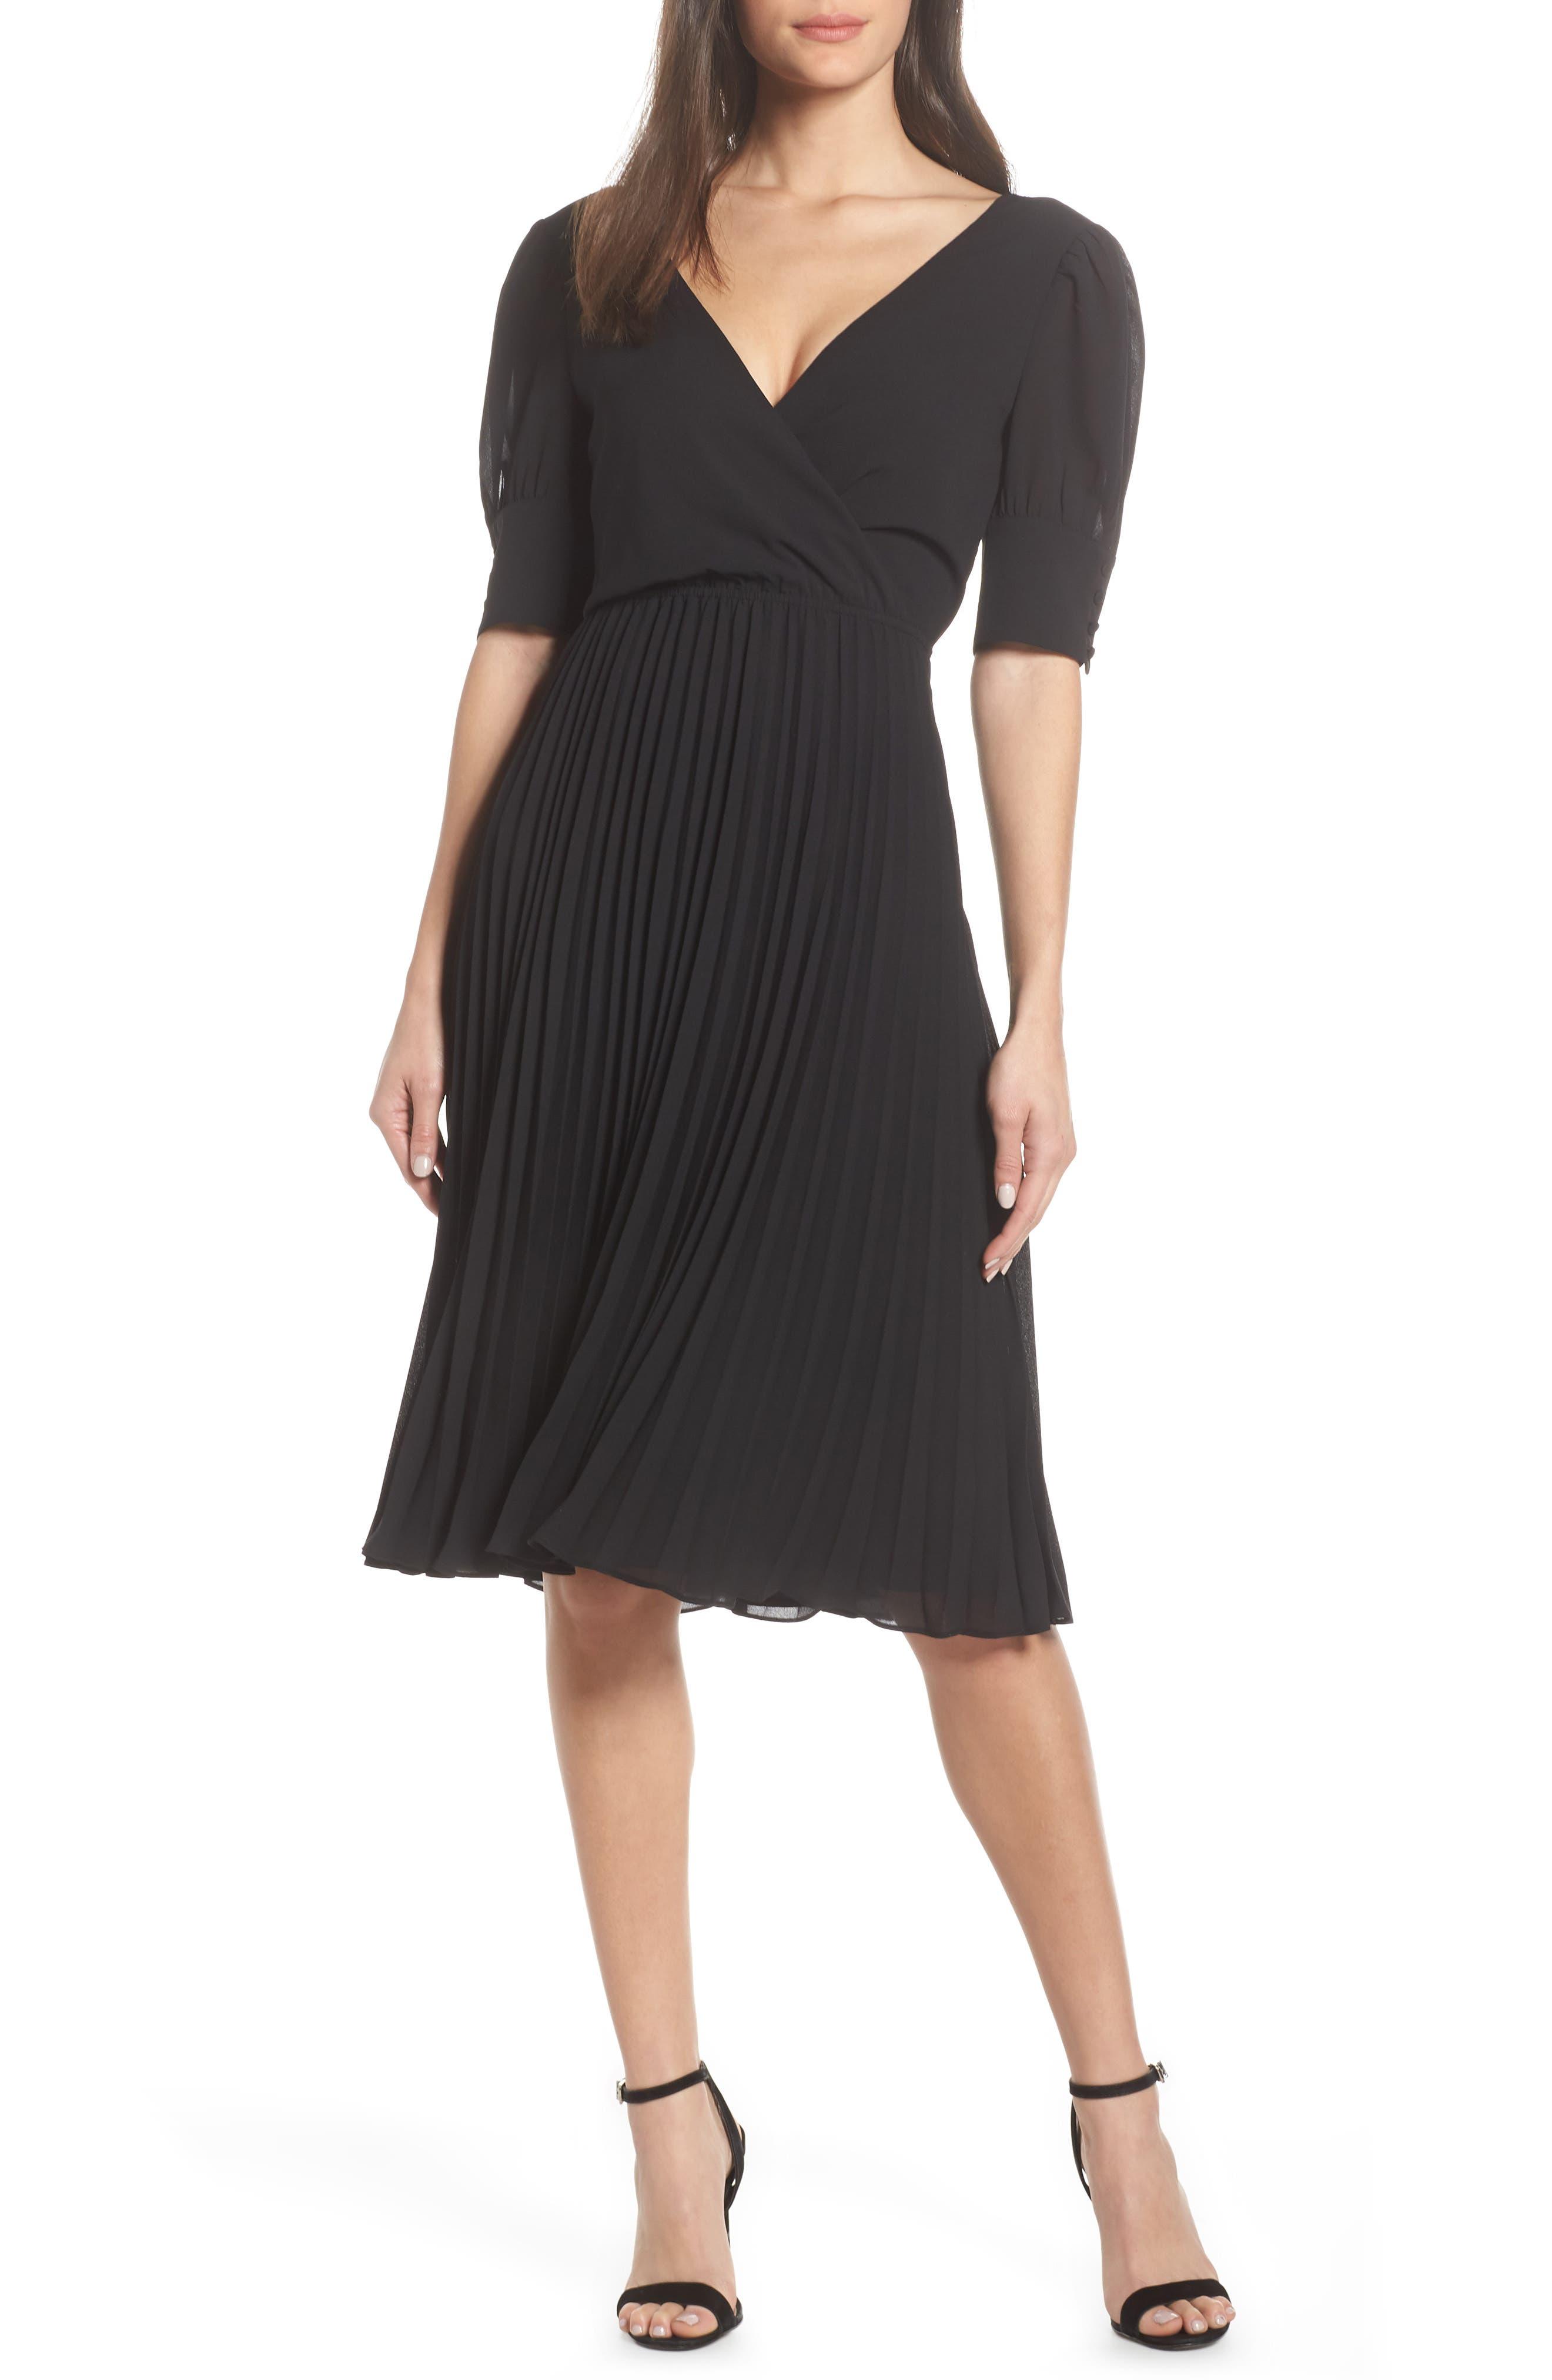 ALI & JAY Angles Flight Chiffon Fit & Flare Dress, Main, color, BLACK